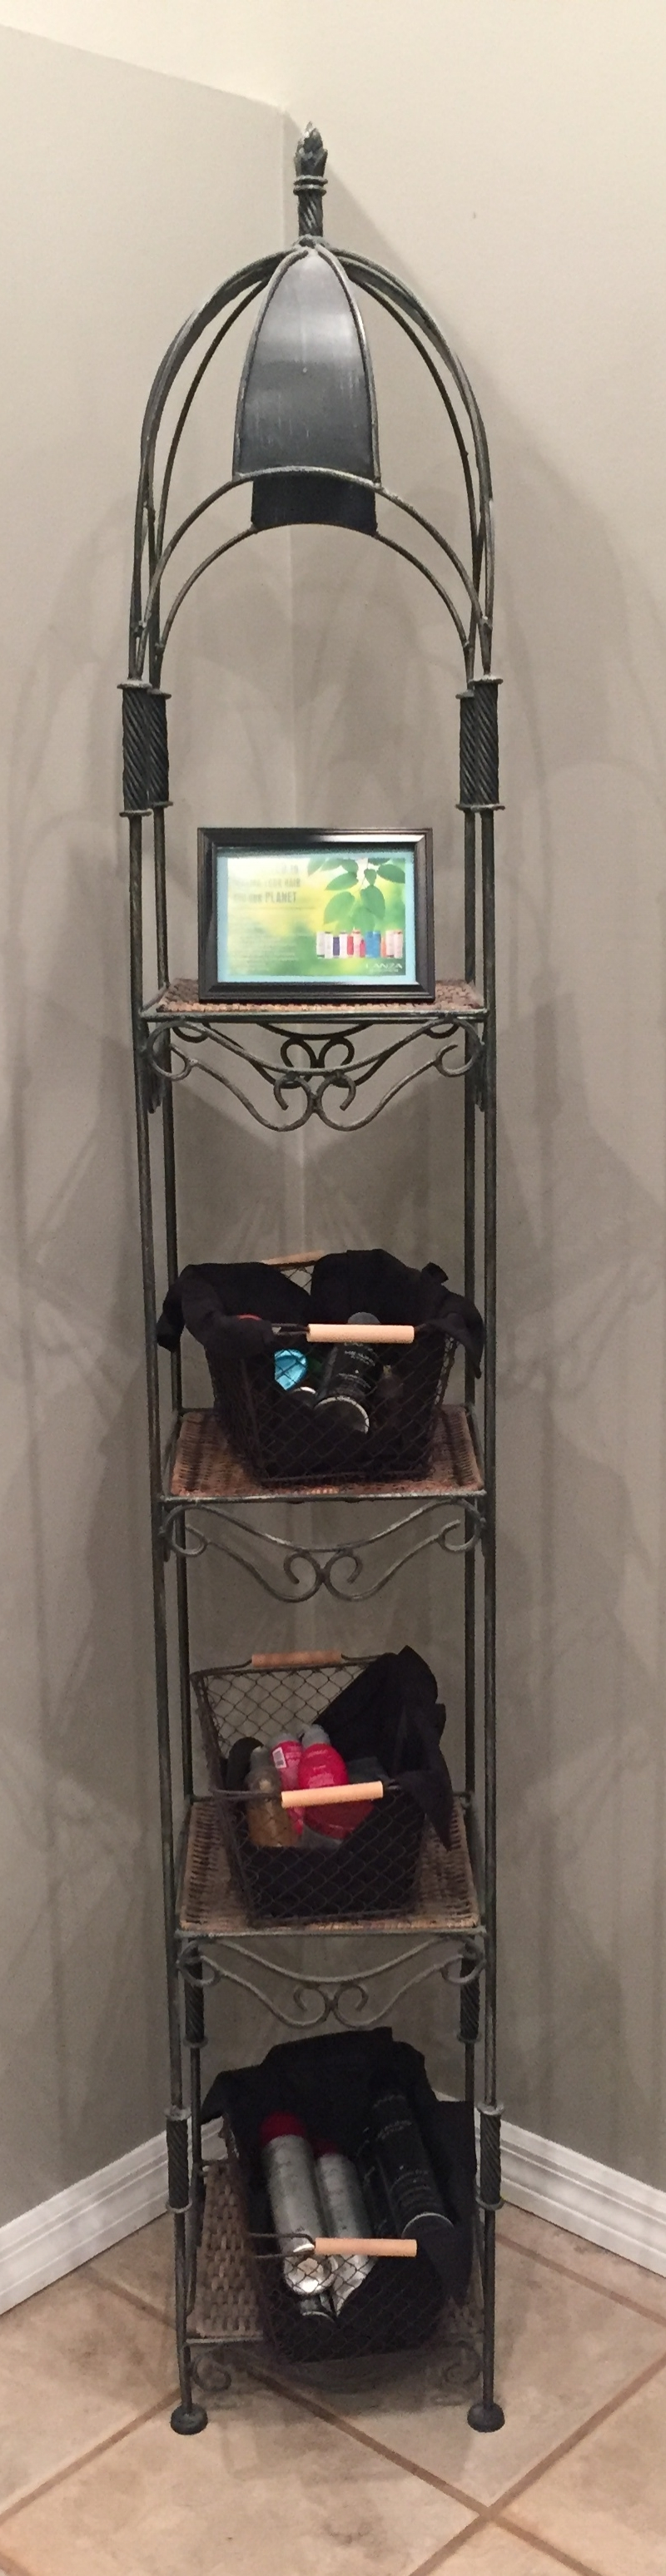 Wicker / Metal Display Shelf - $30